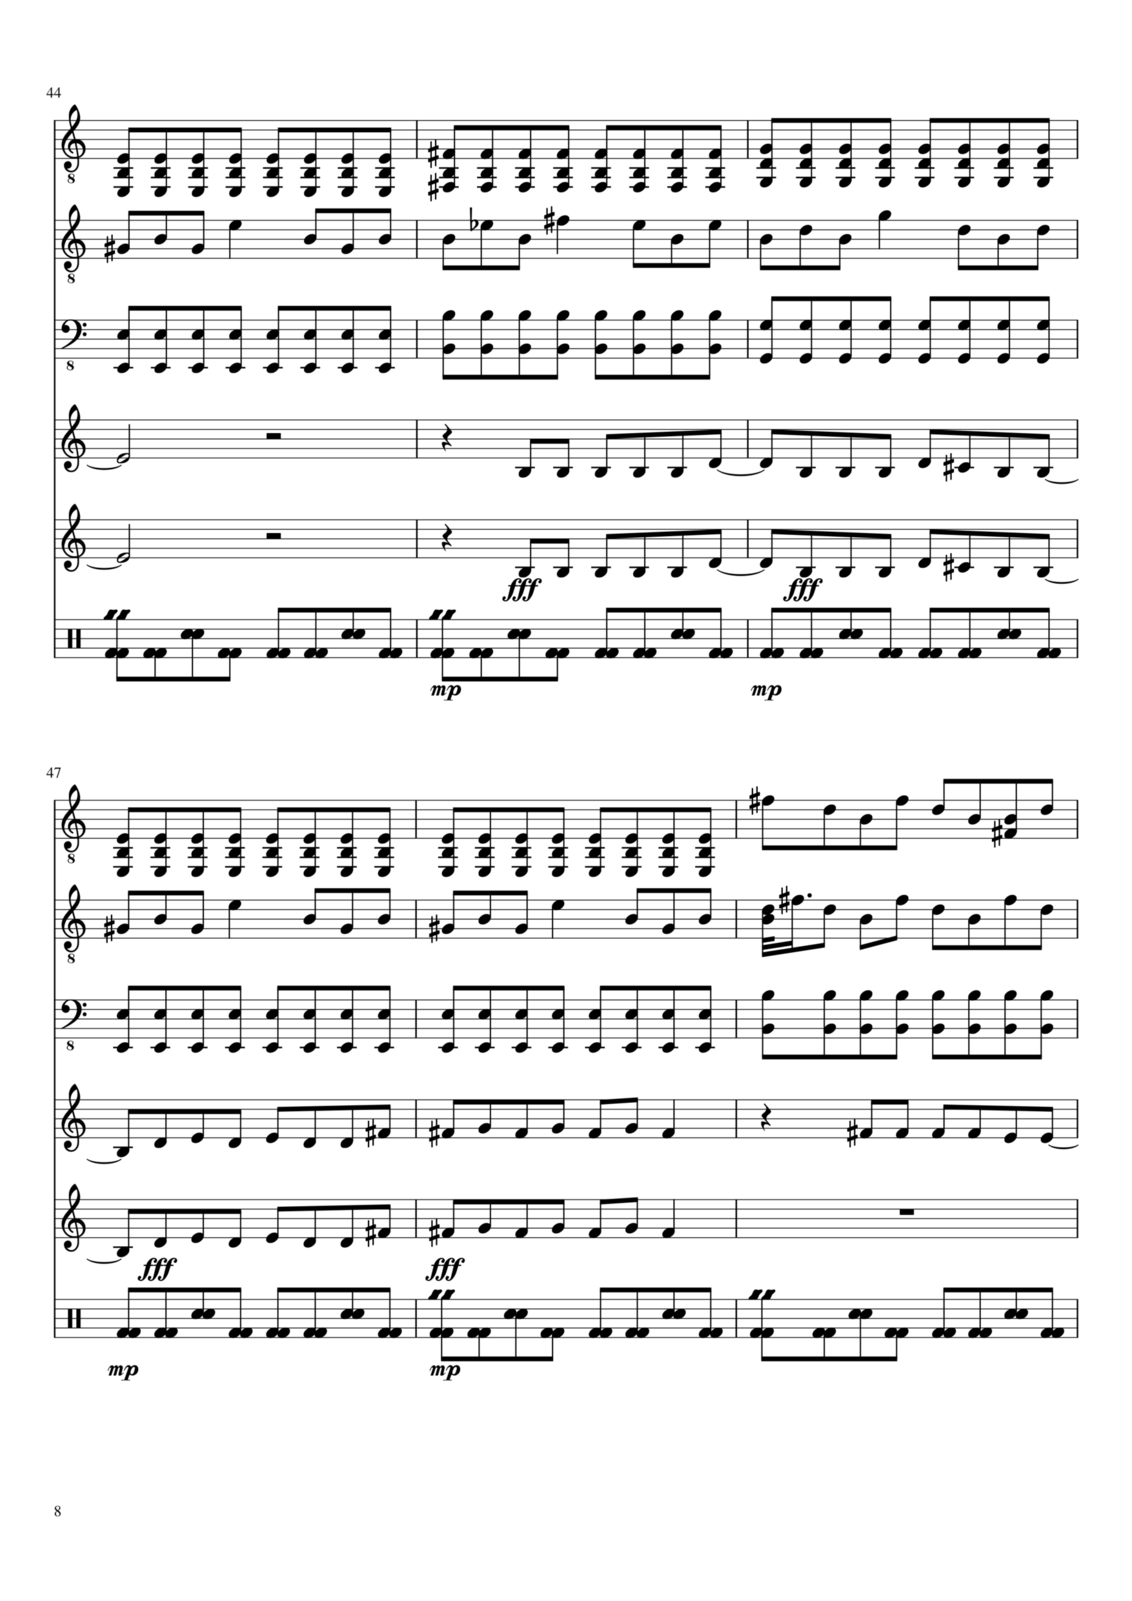 Ot Bolshogo Uma slide, Image 8